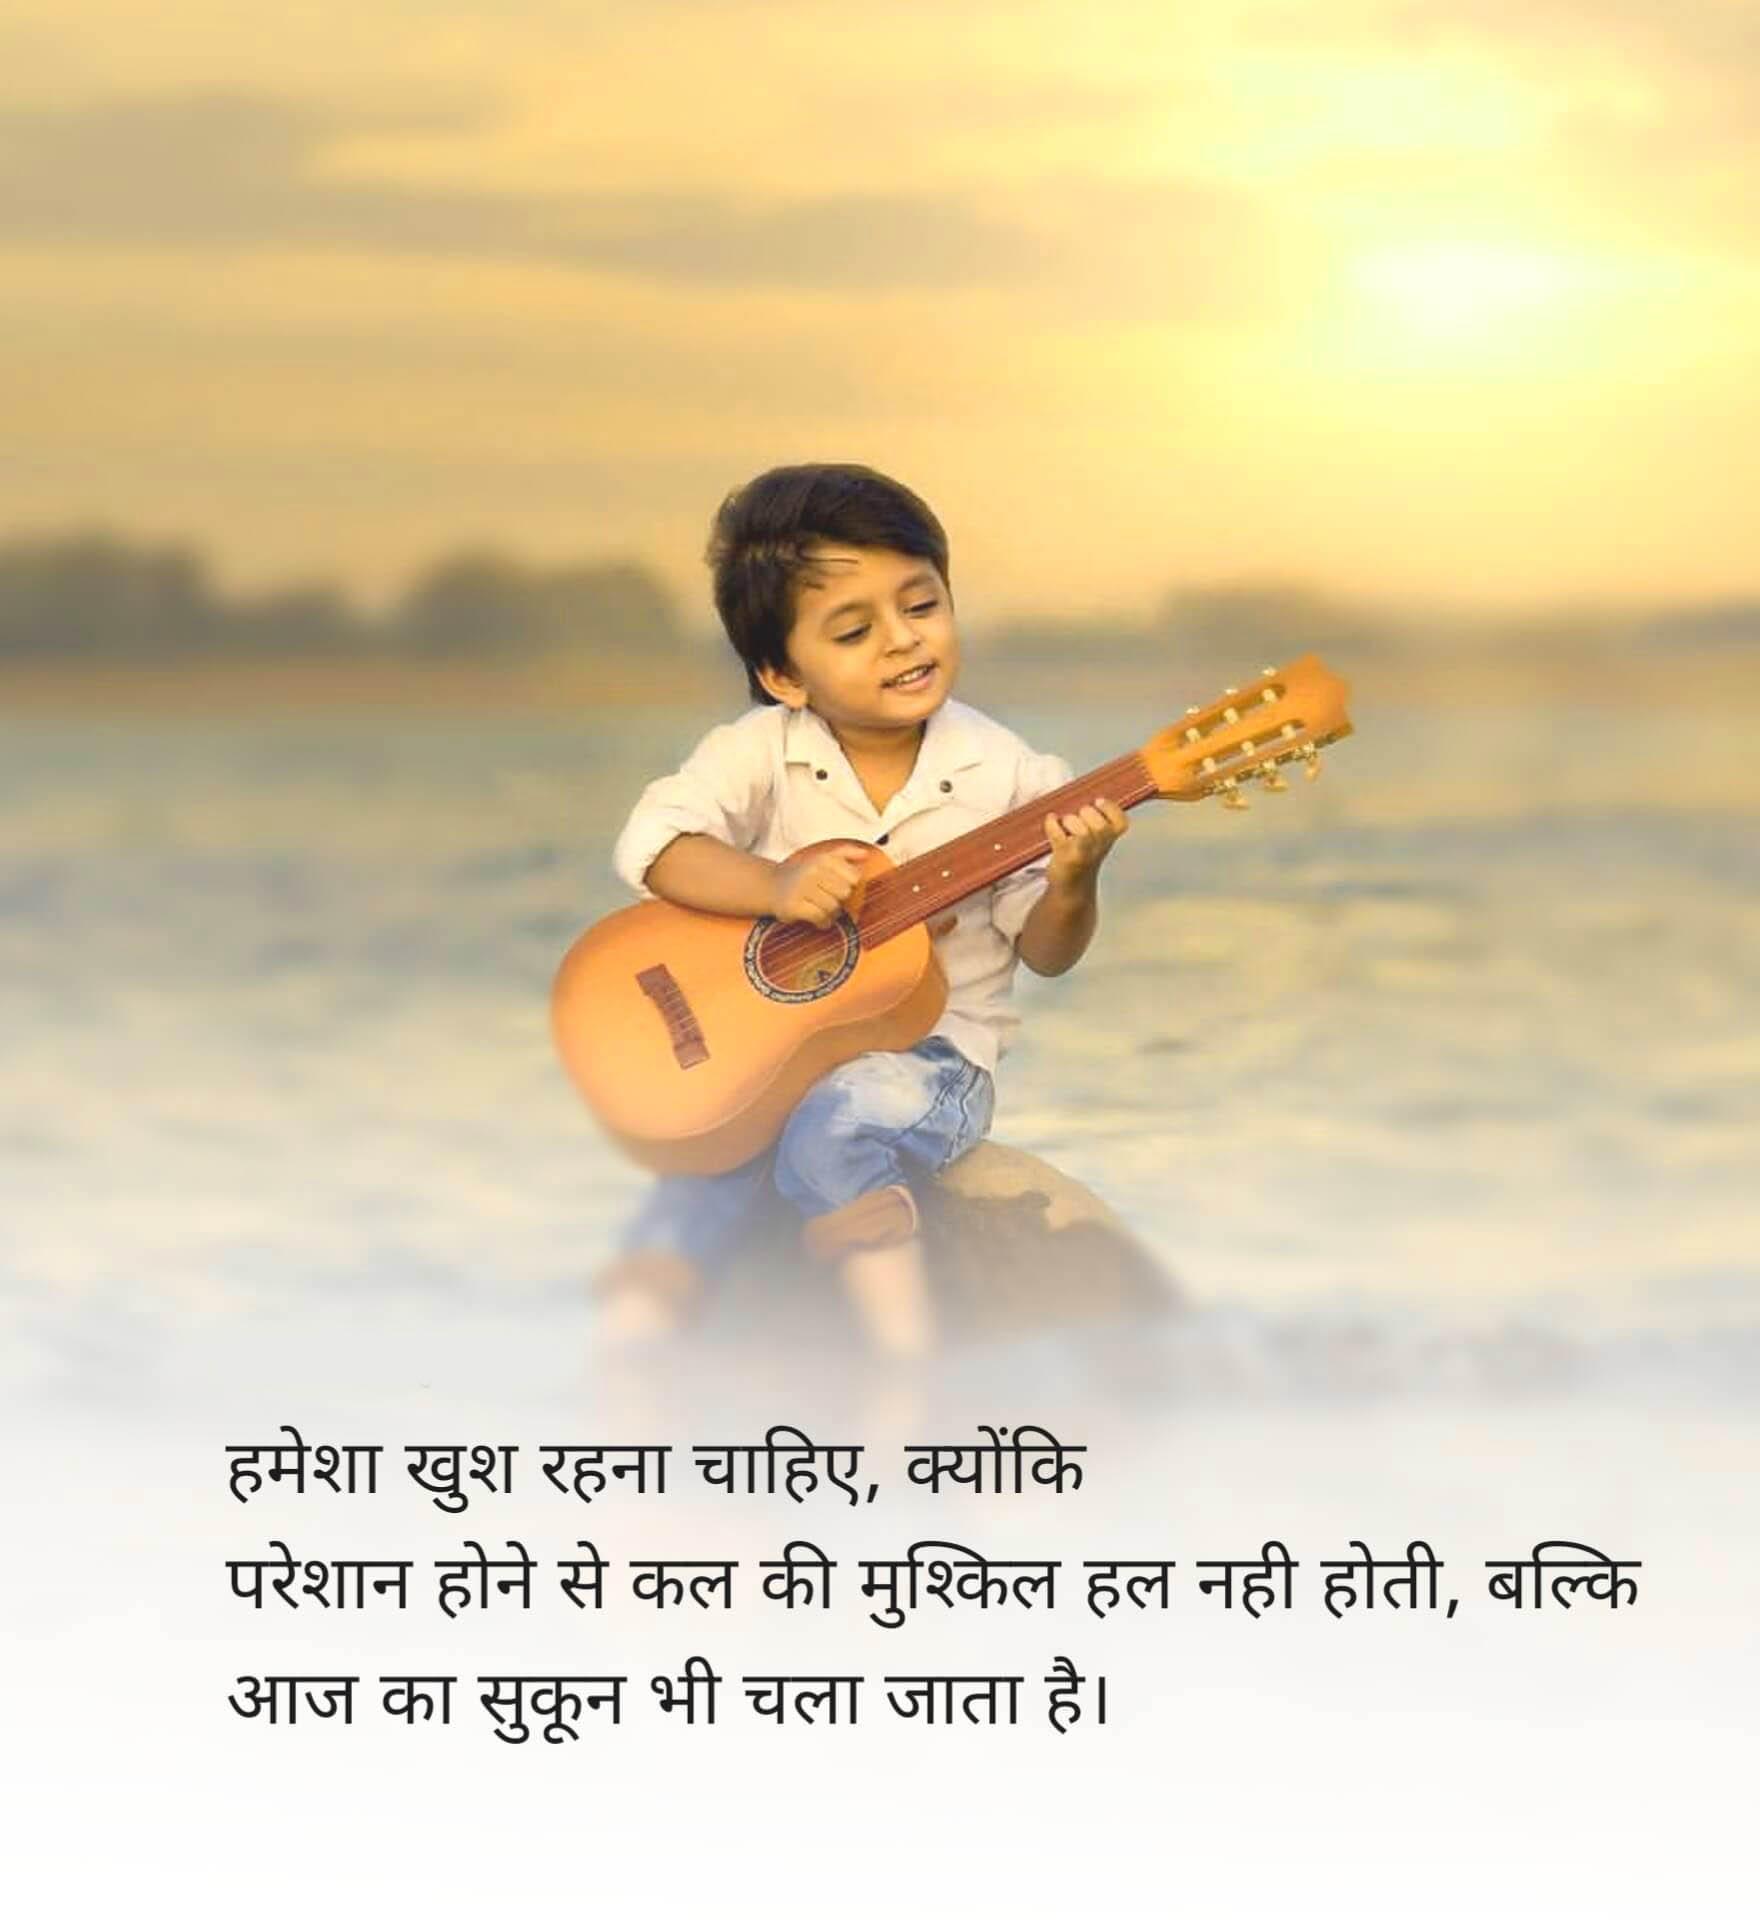 Whatsapp DP Pics Images With Hindi Quotes